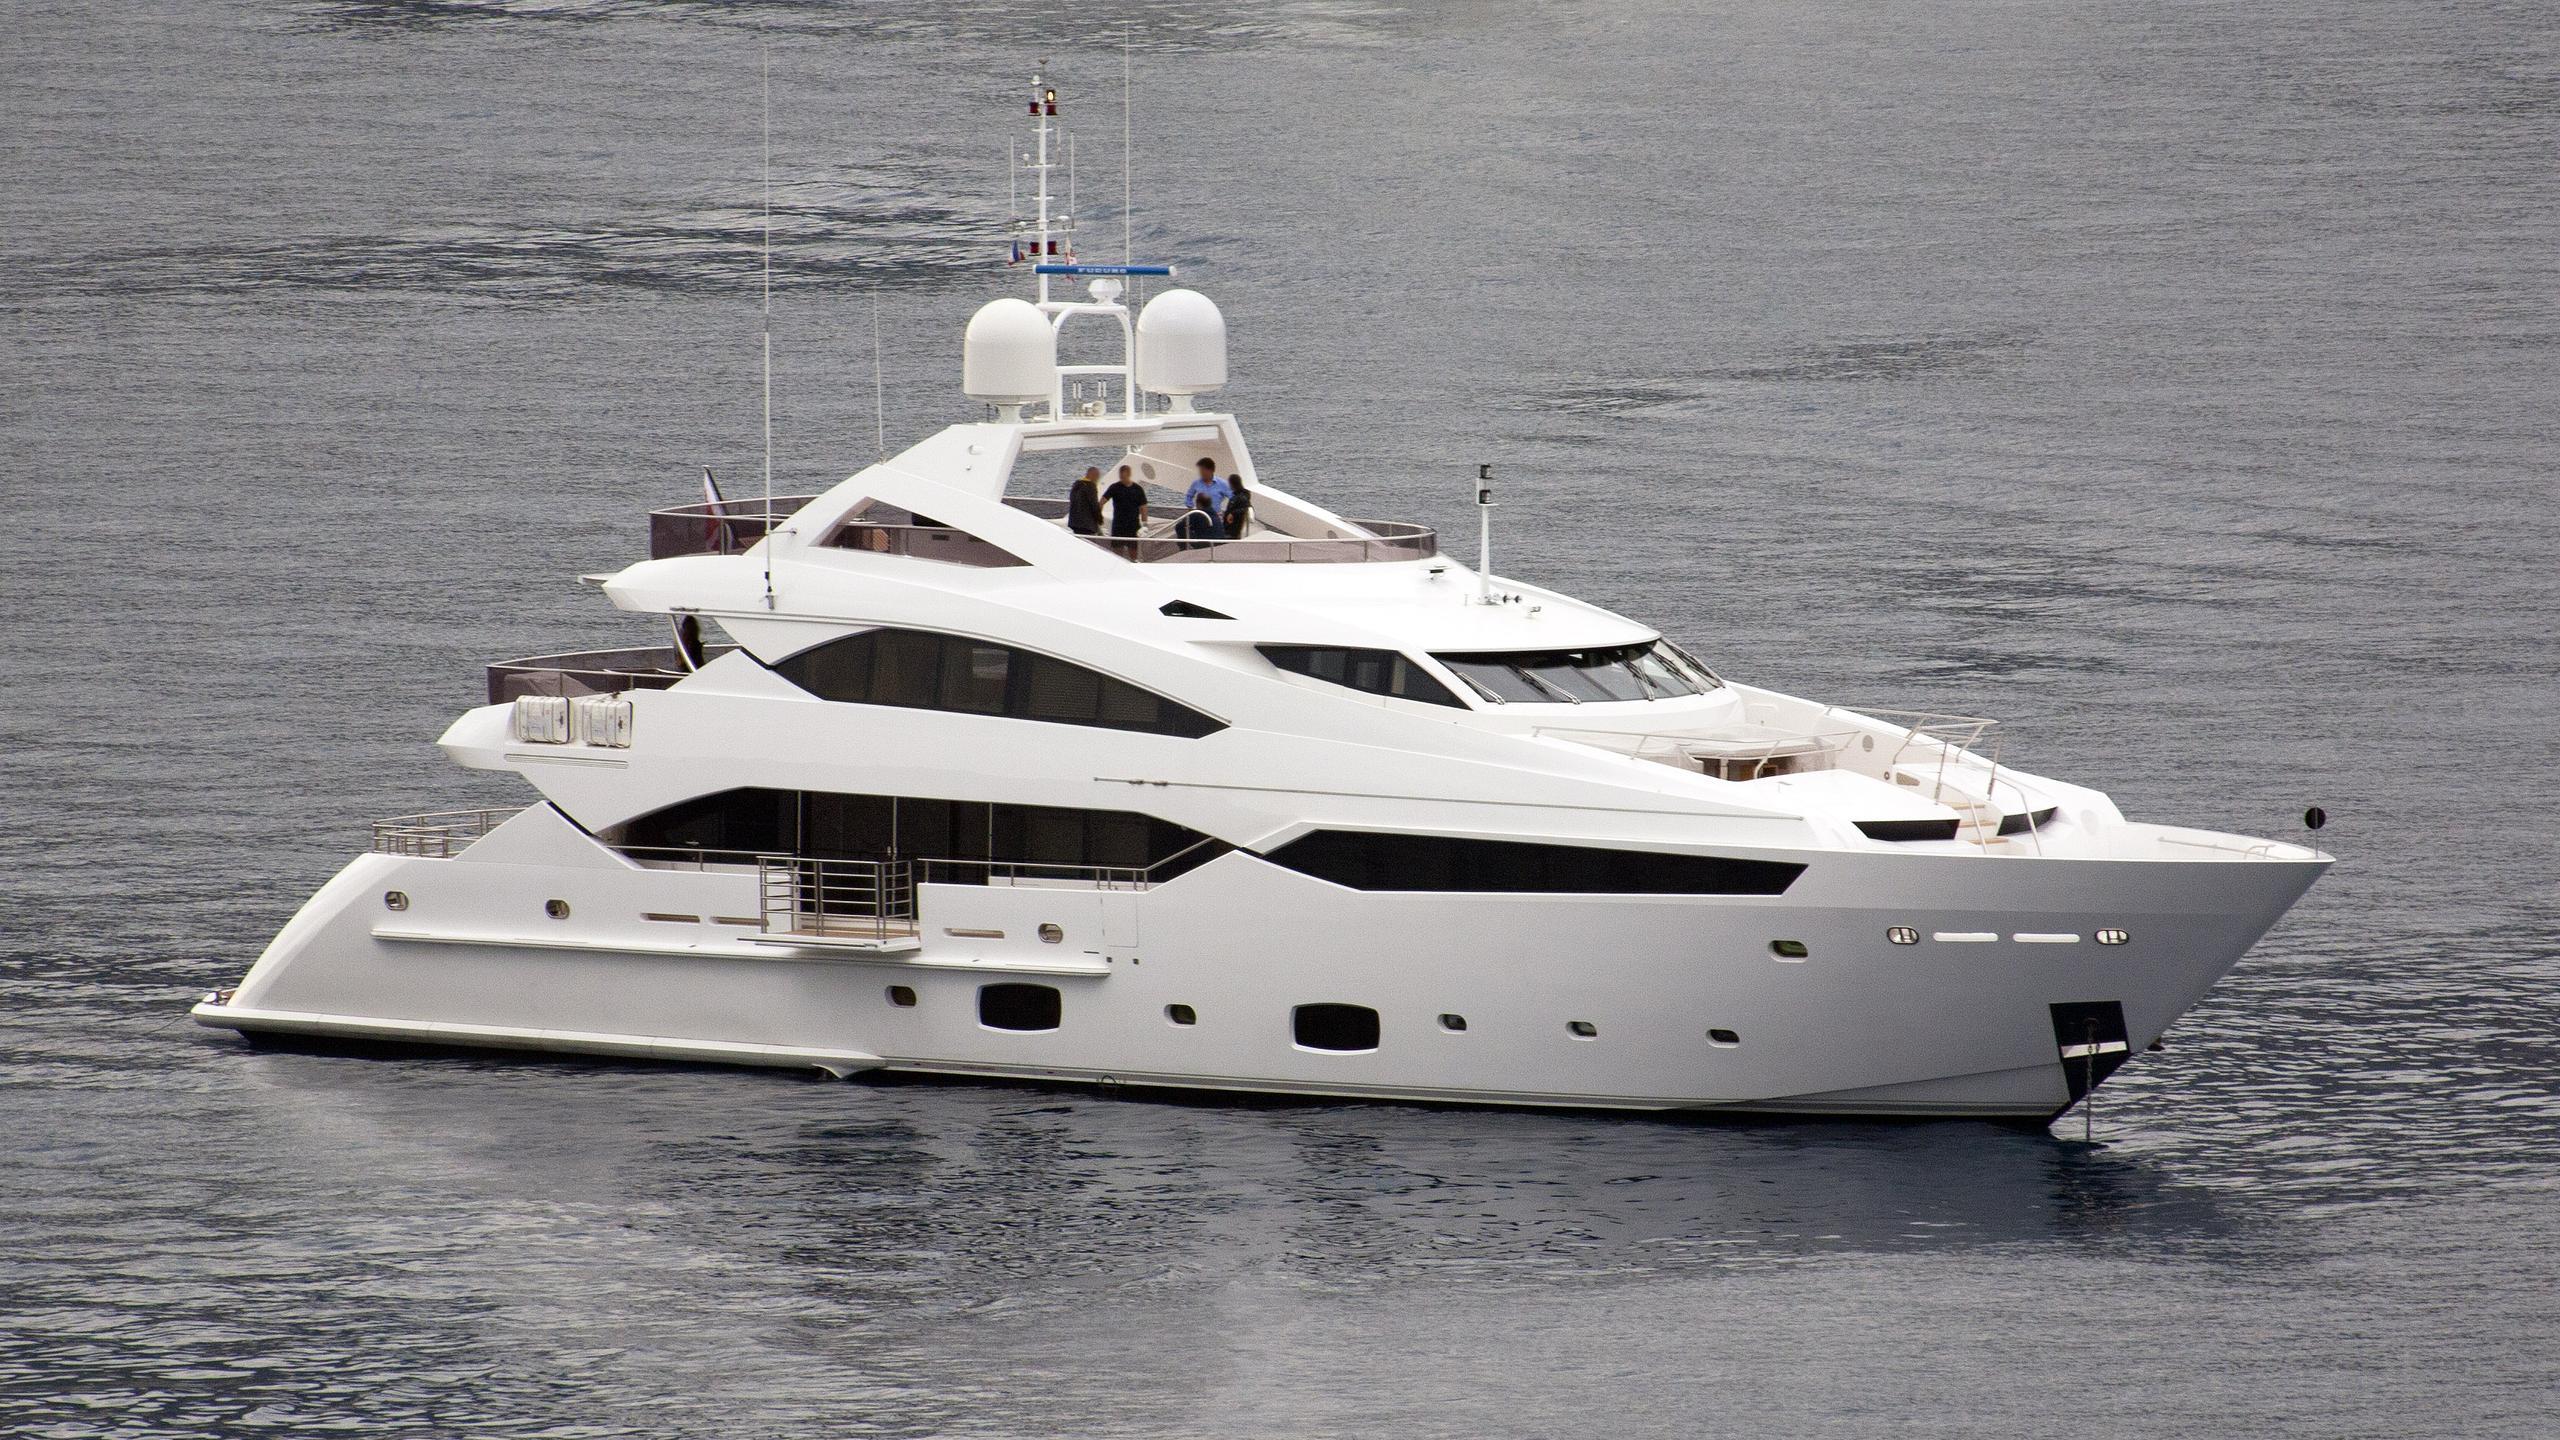 thumper-motor-yacht-sunseeker-40M-2014-40m-profile